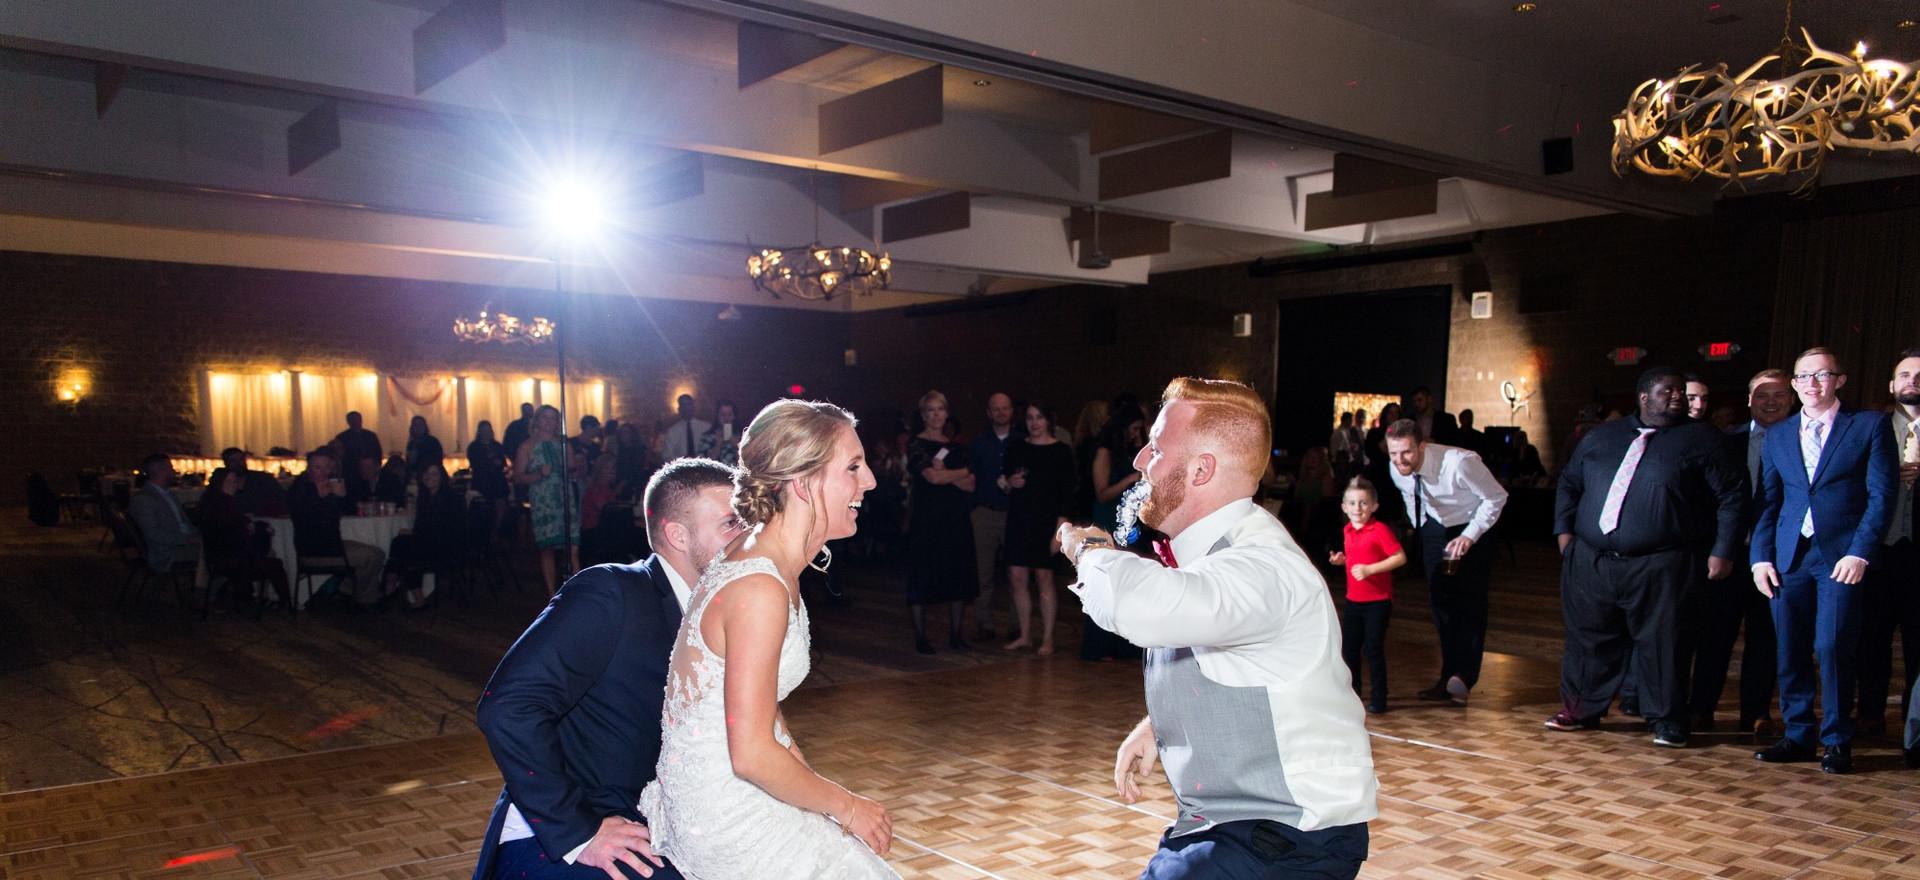 Kayla-Chris-Wedding-2018-619_edited.jpg